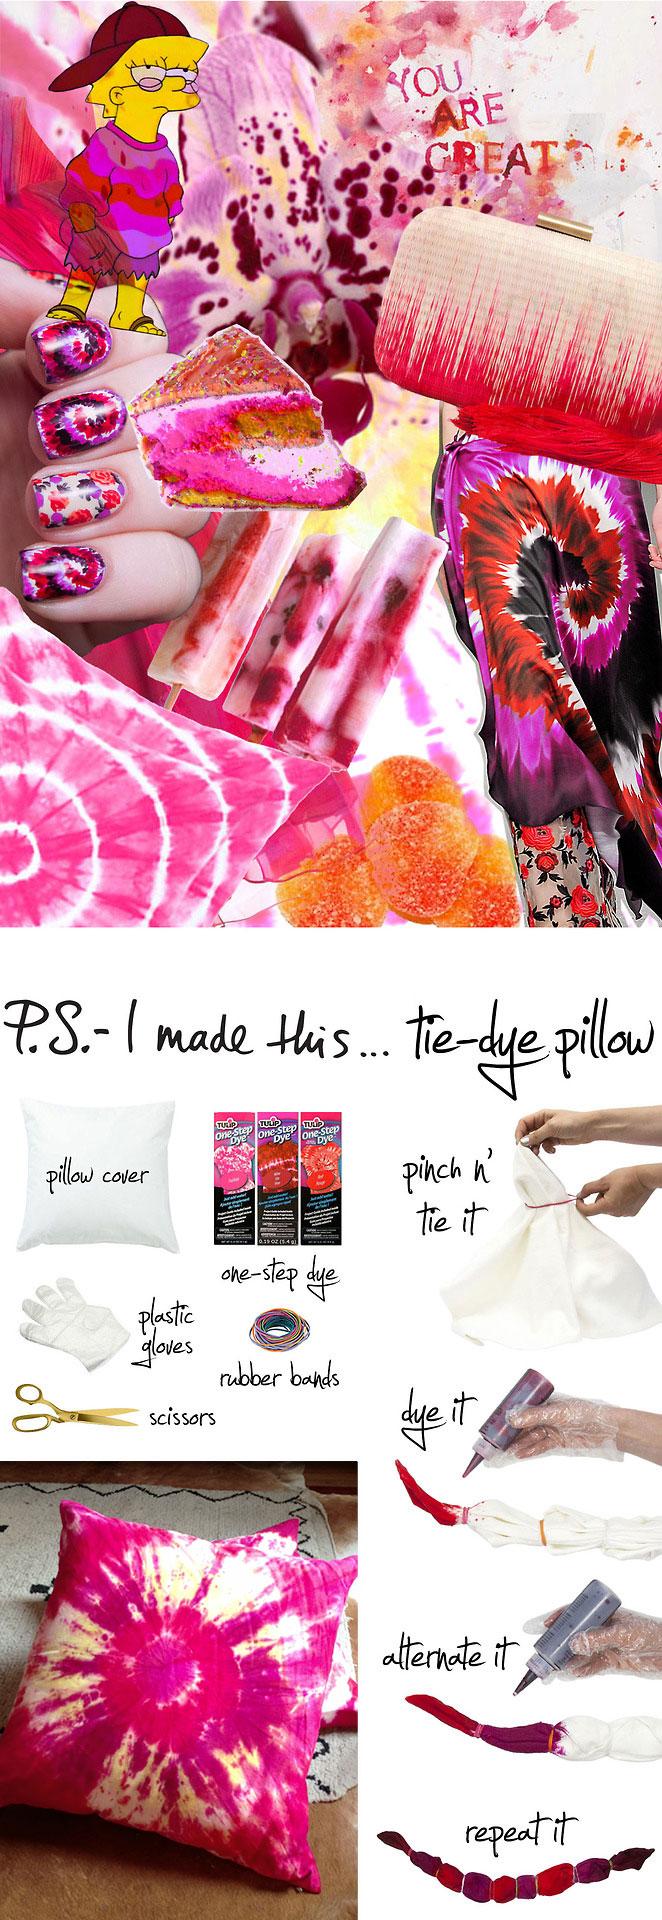 tie_dye_pillow-tumblr_MERGED